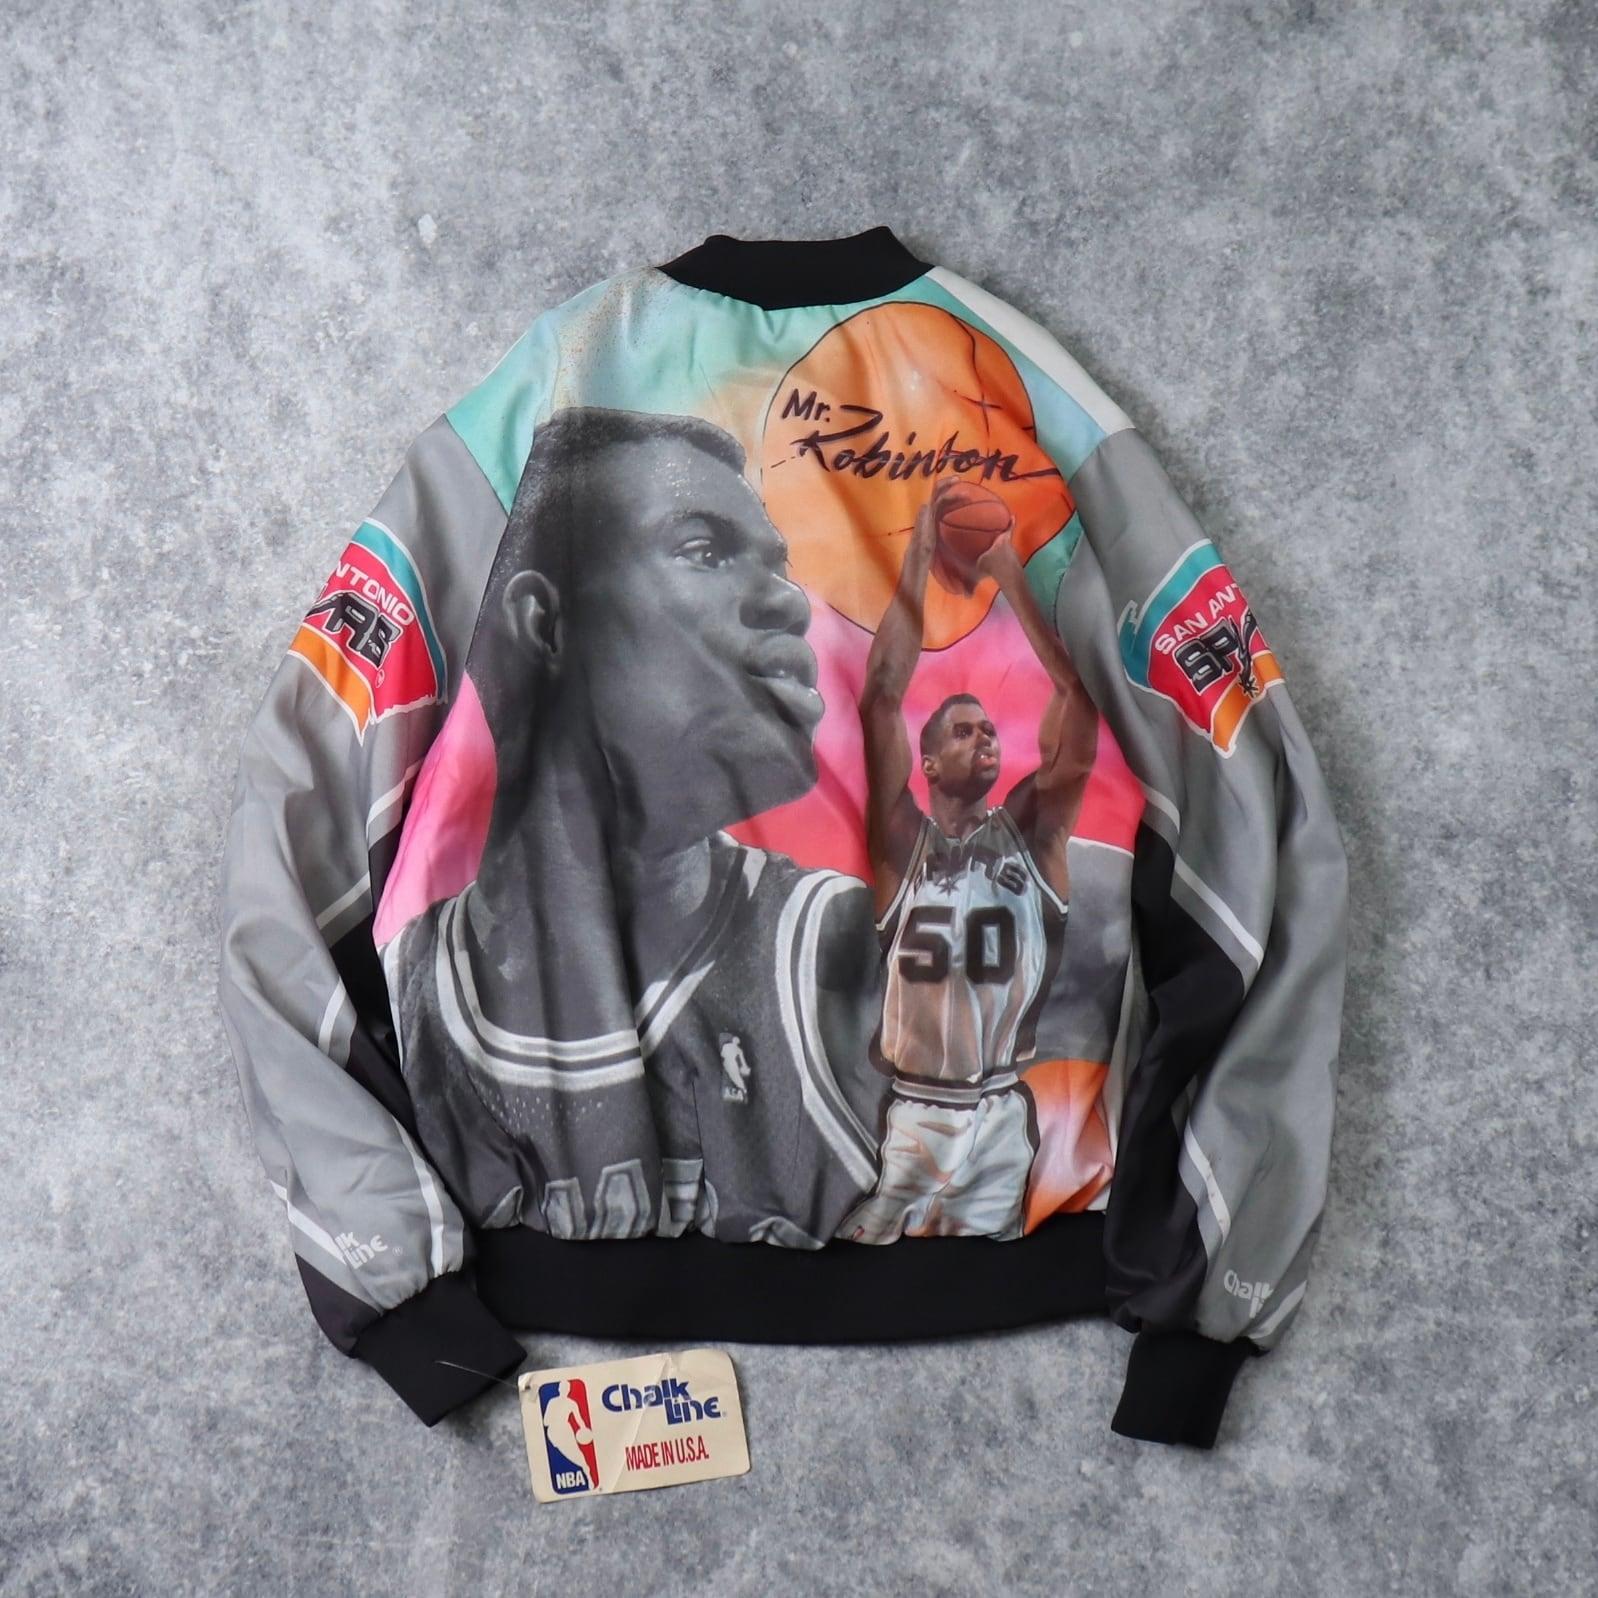 90's【Dead Stock】Chalk Line NBA jacket 90年代 チョークライン デッドストック バスケ ブルゾン スタジャン ナイロンジャケット ヴィンテージ  古着 A513